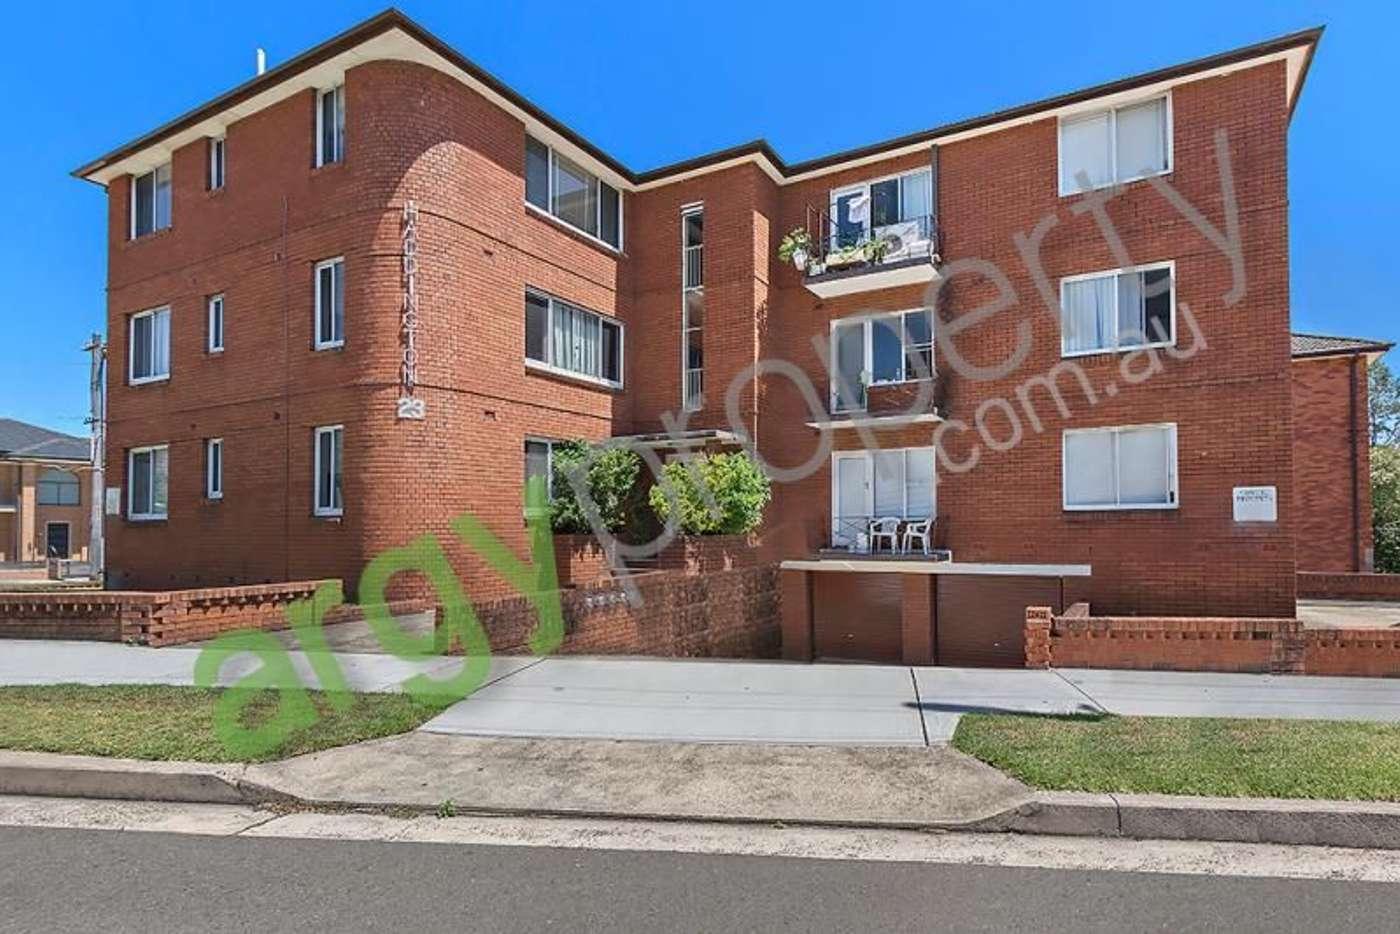 Main view of Homely apartment listing, 2/23 Railway Street, Kogarah NSW 2217